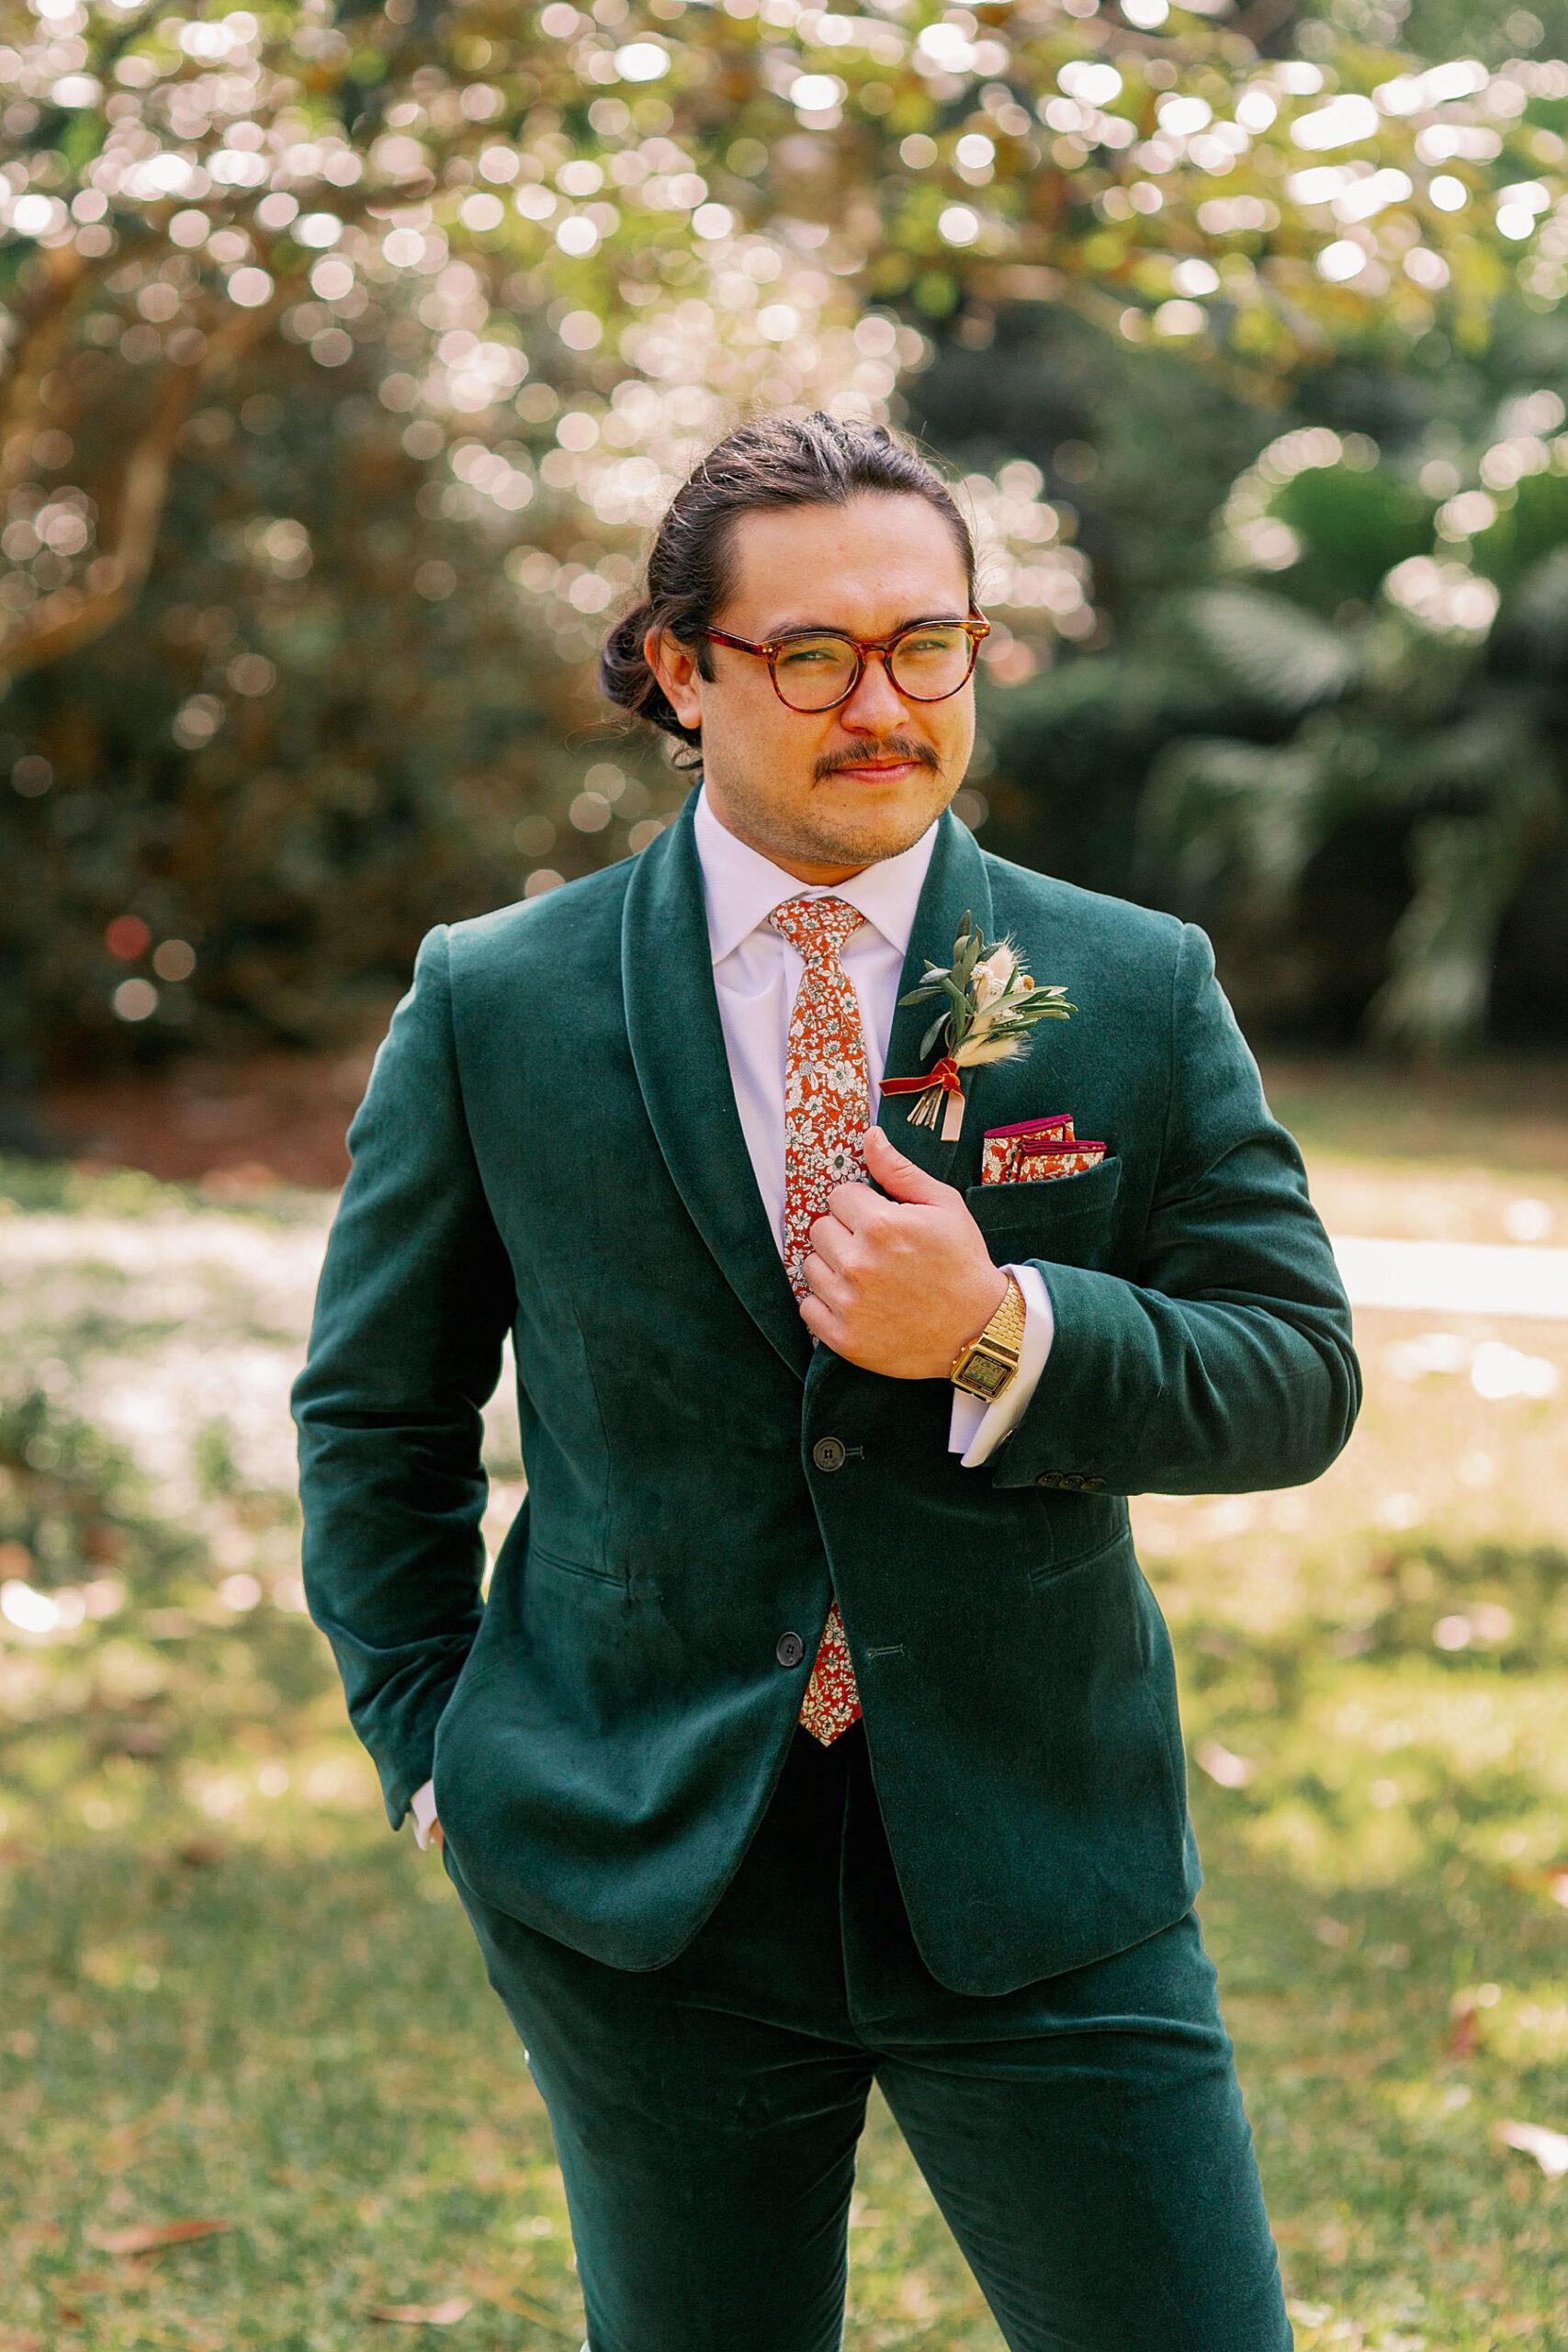 Portrait of Groom in green velvet suit on wedding day